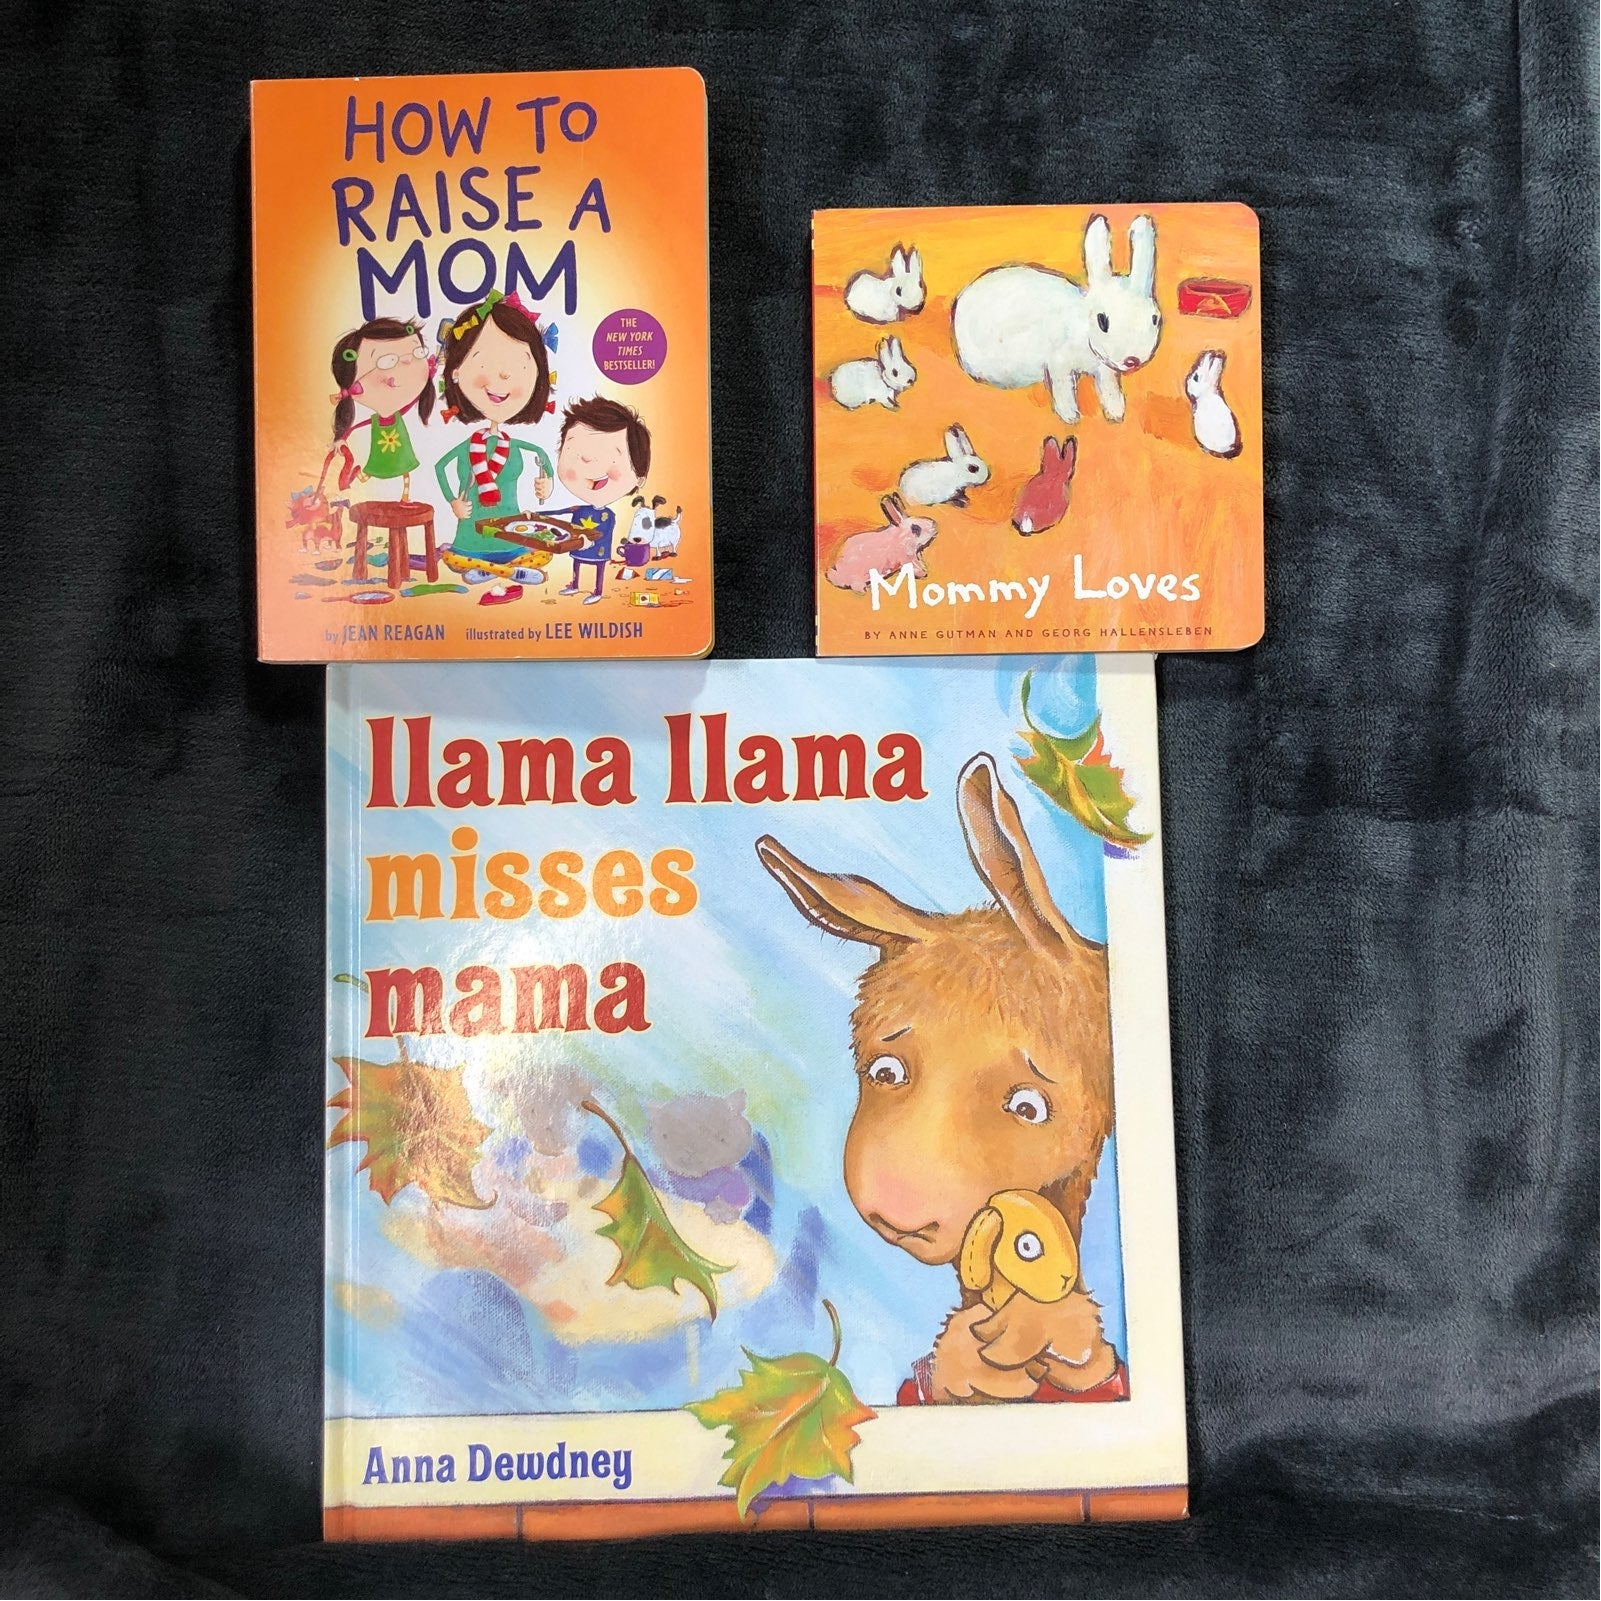 Llama llama Misses Mama and 2 books